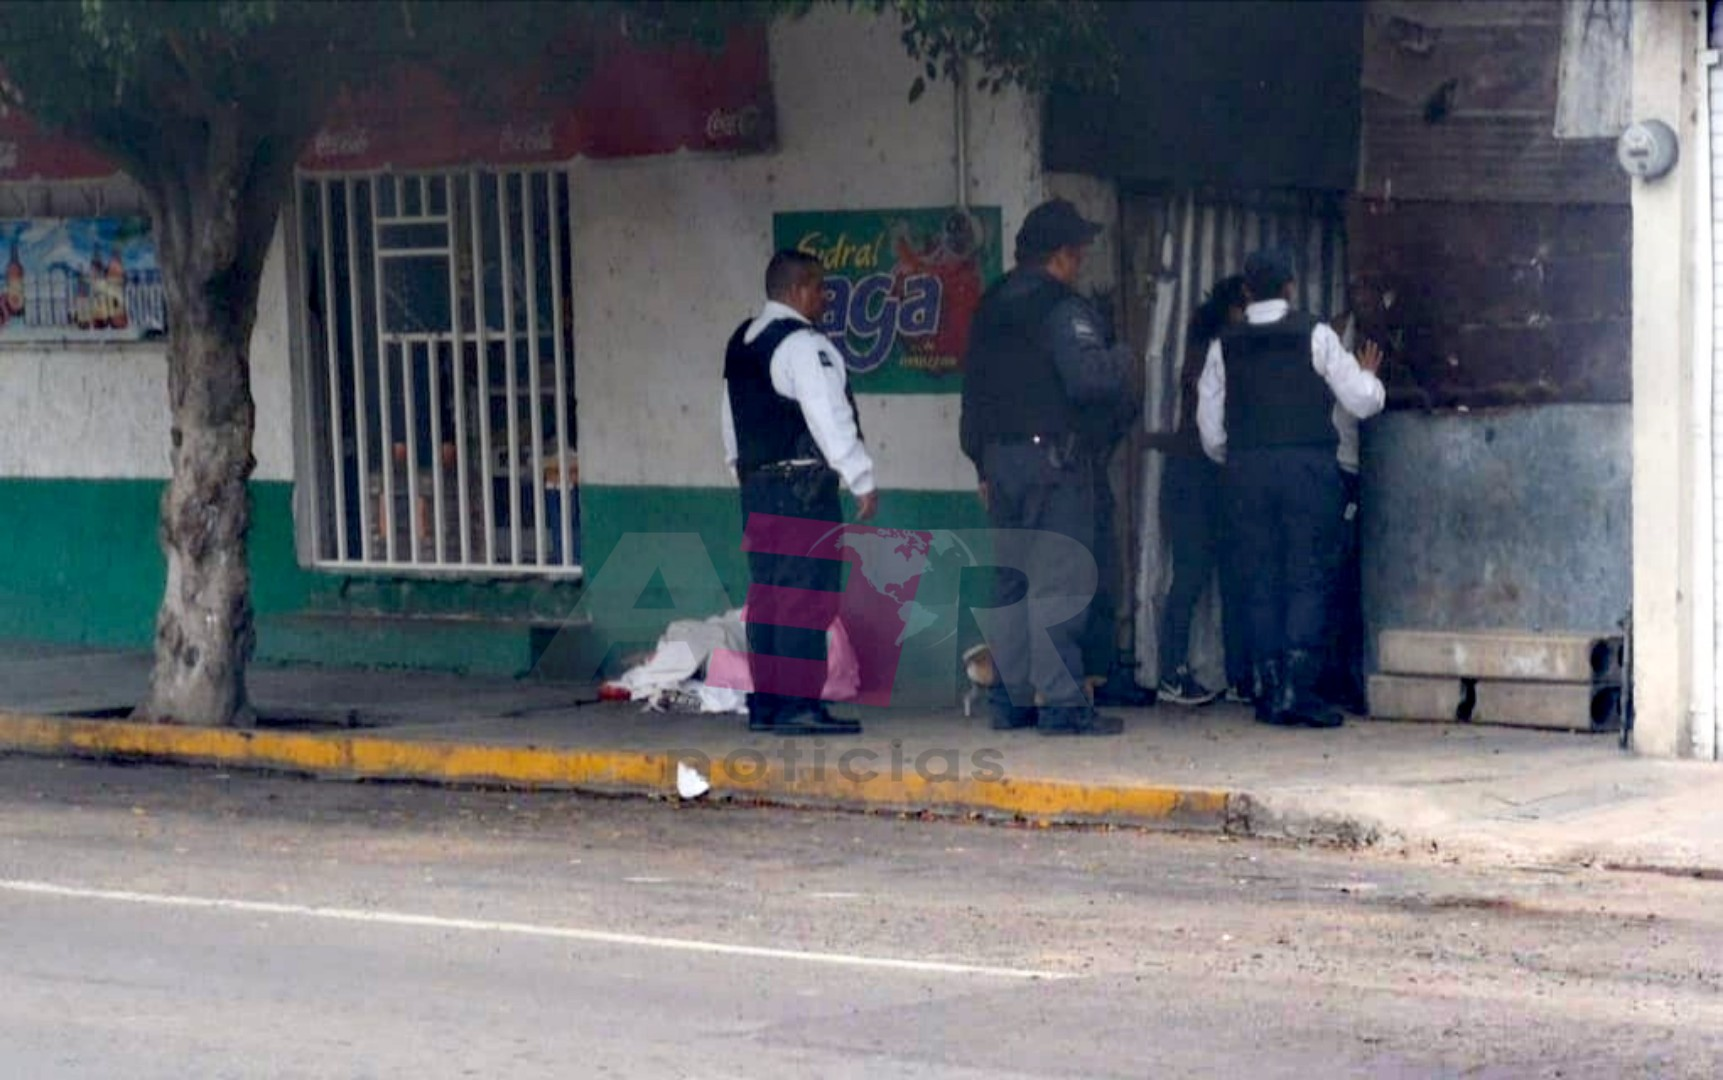 EJECUTAN A HOMBRE EN CALZADA DE LOS CHINACOS 4